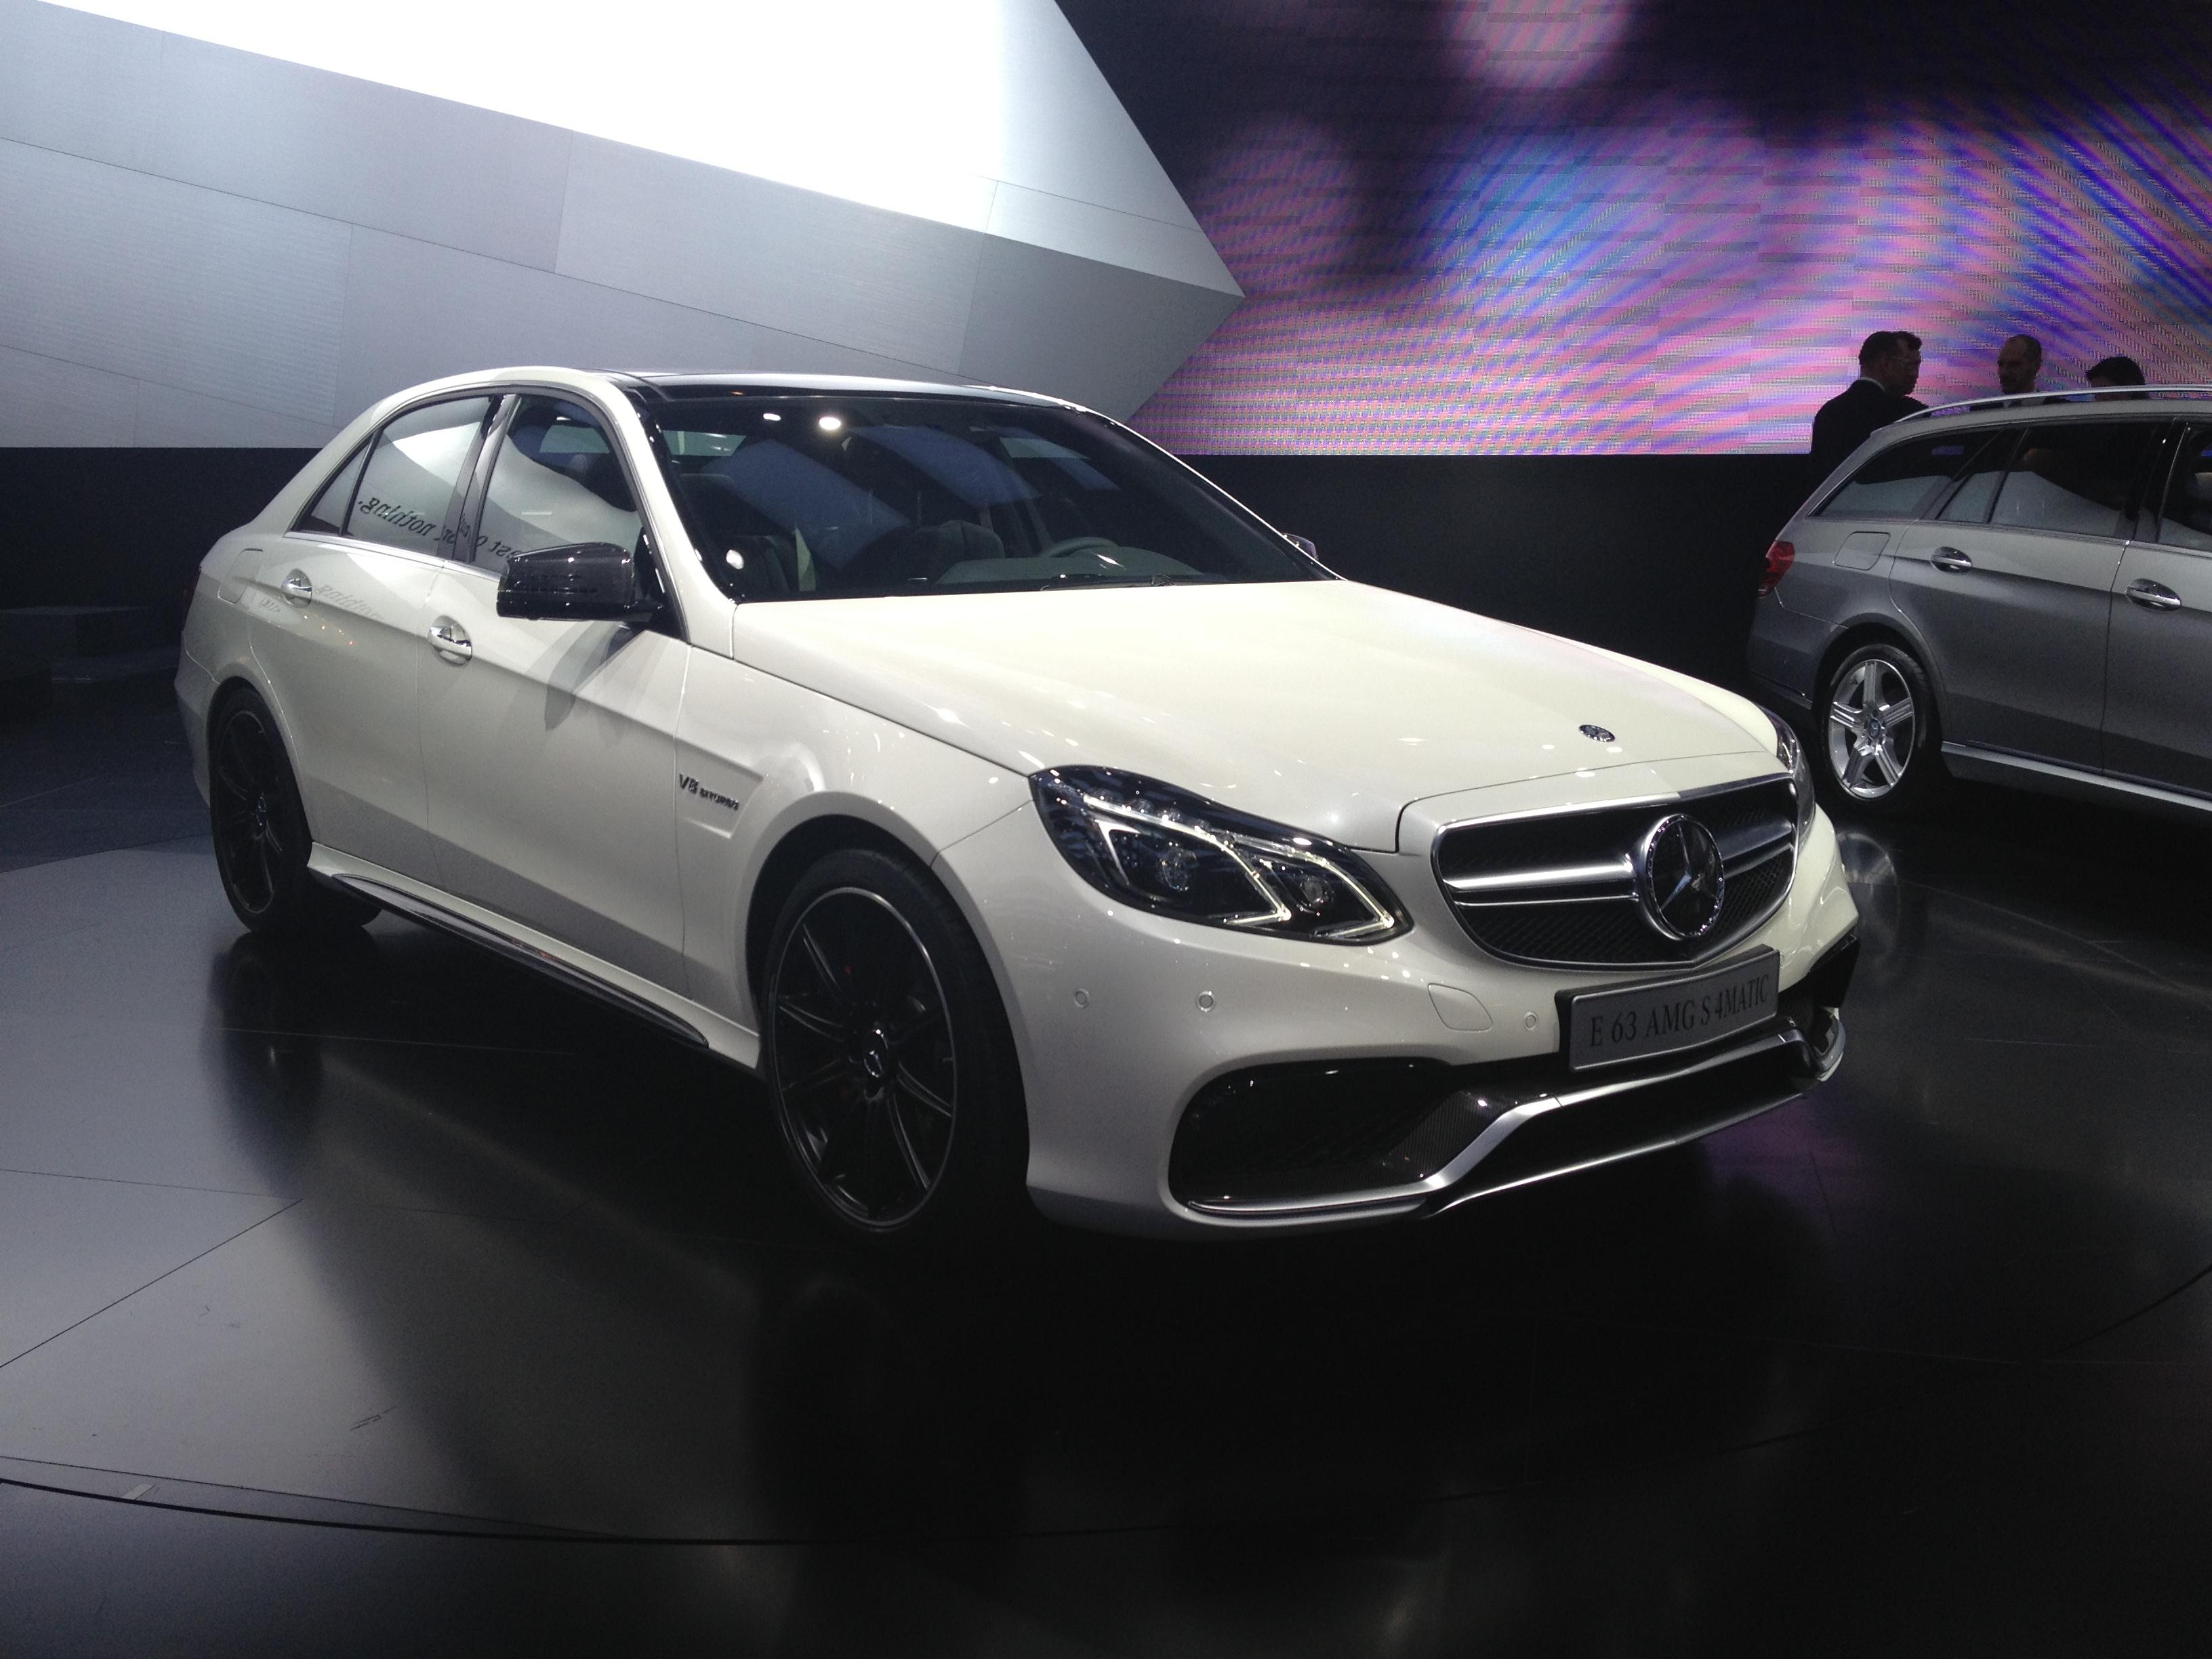 File:2014 Mercedes-Benz E63 AMG S 4MATIC (8404447380).jpg